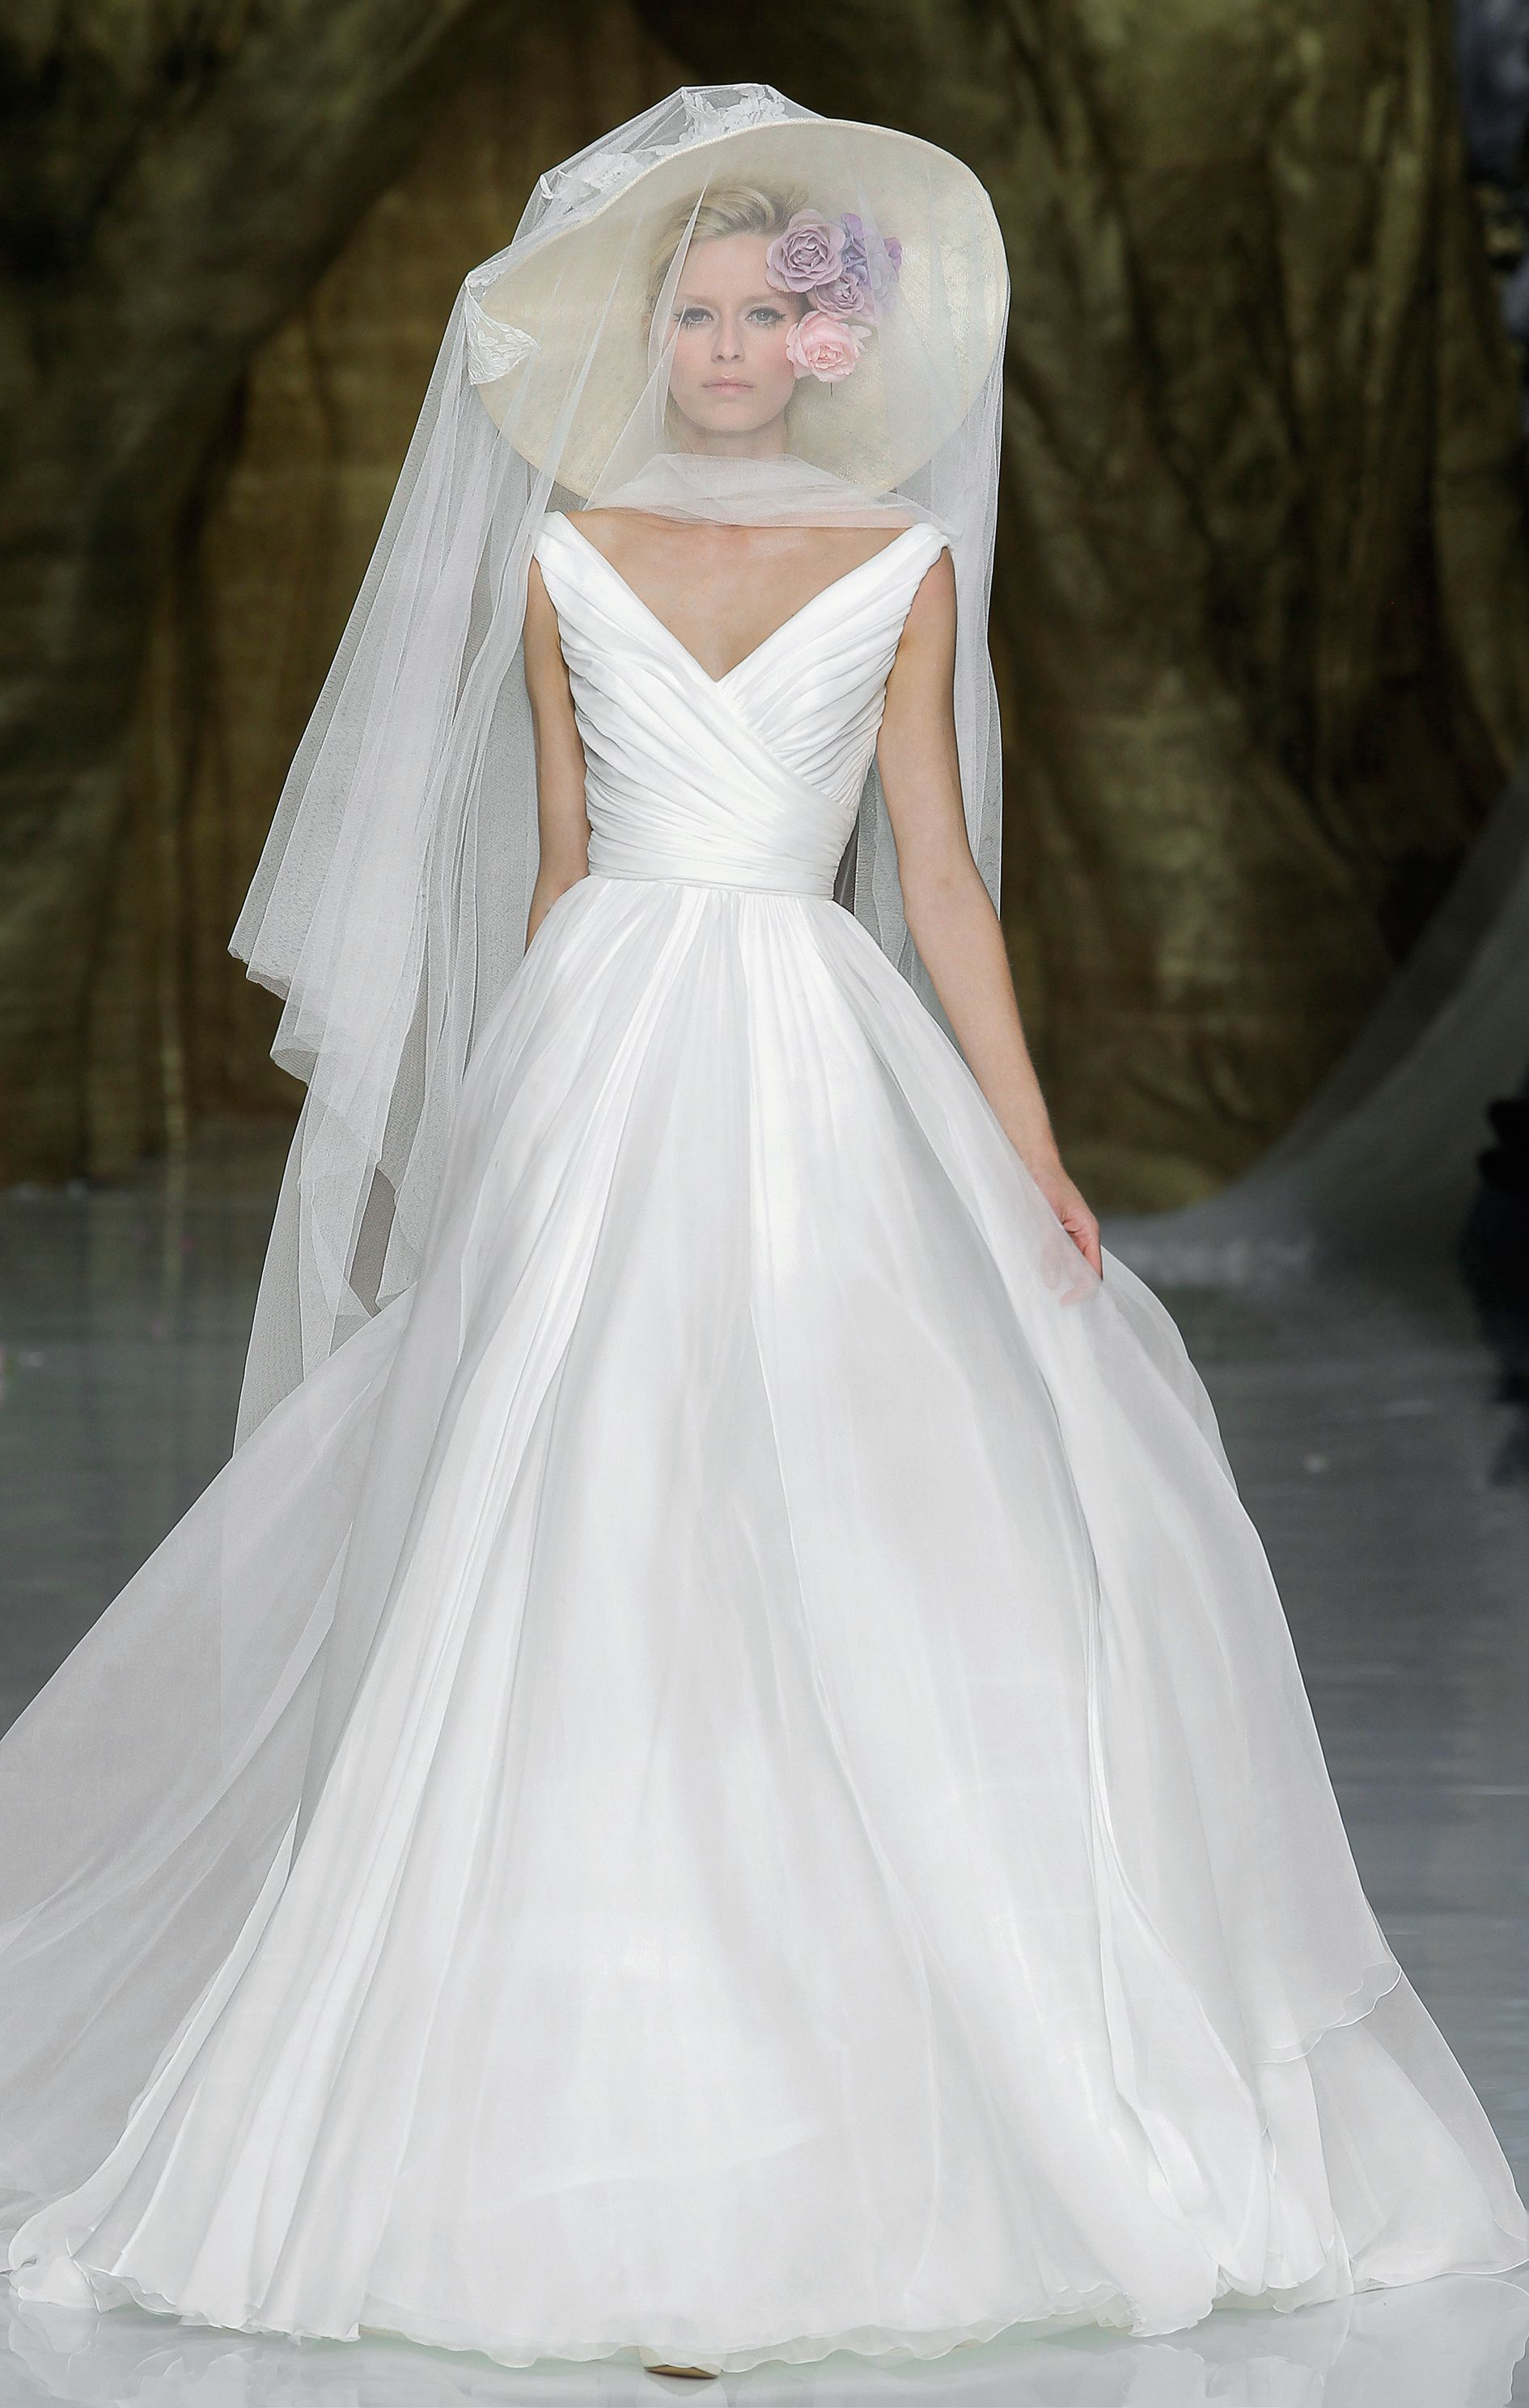 7 Pronovias Wedding Dresses We Love | Pinterest | Pronovias wedding ...